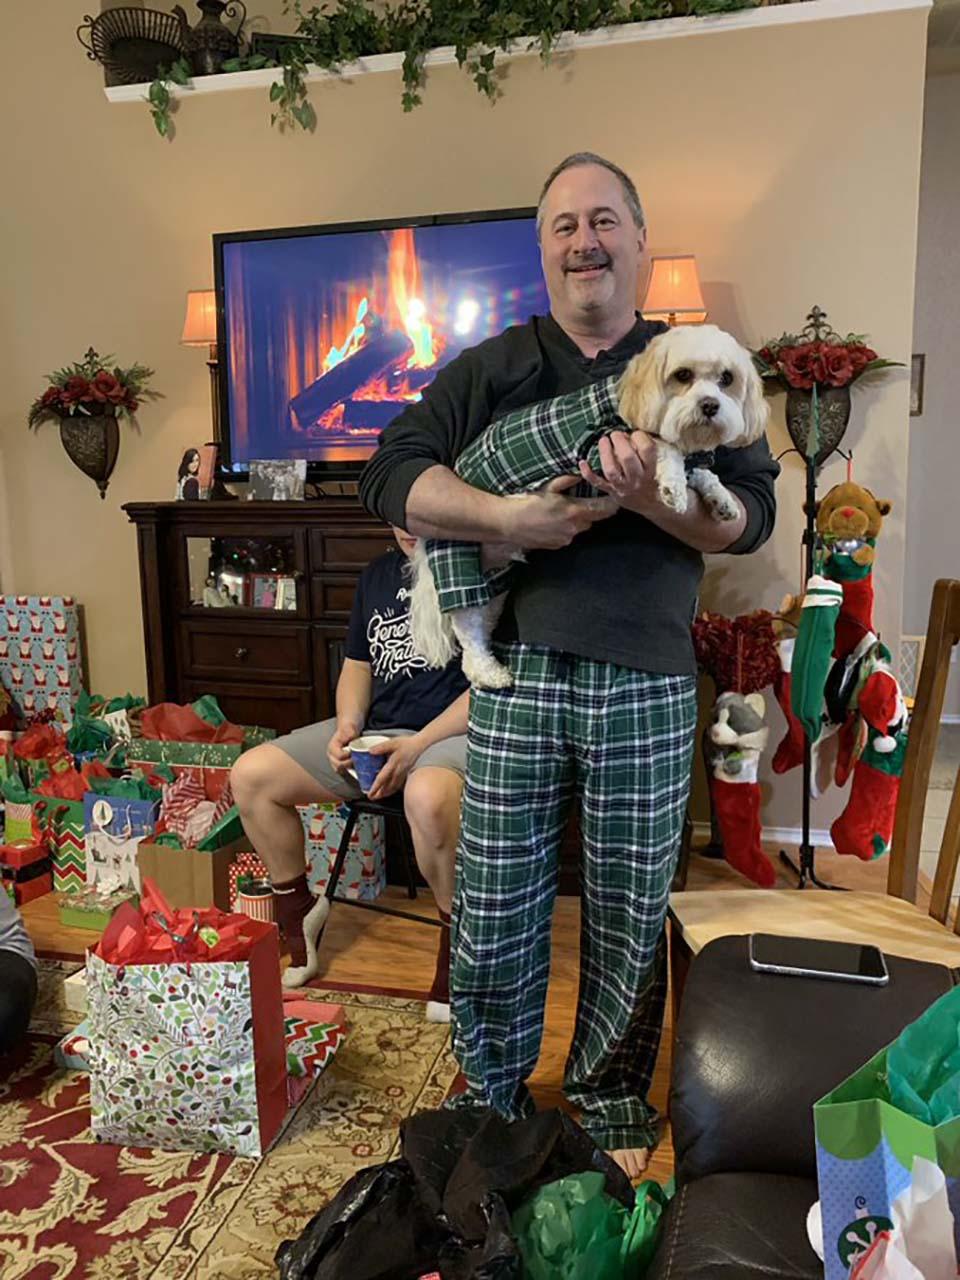 Papá y su mascota en pijamas